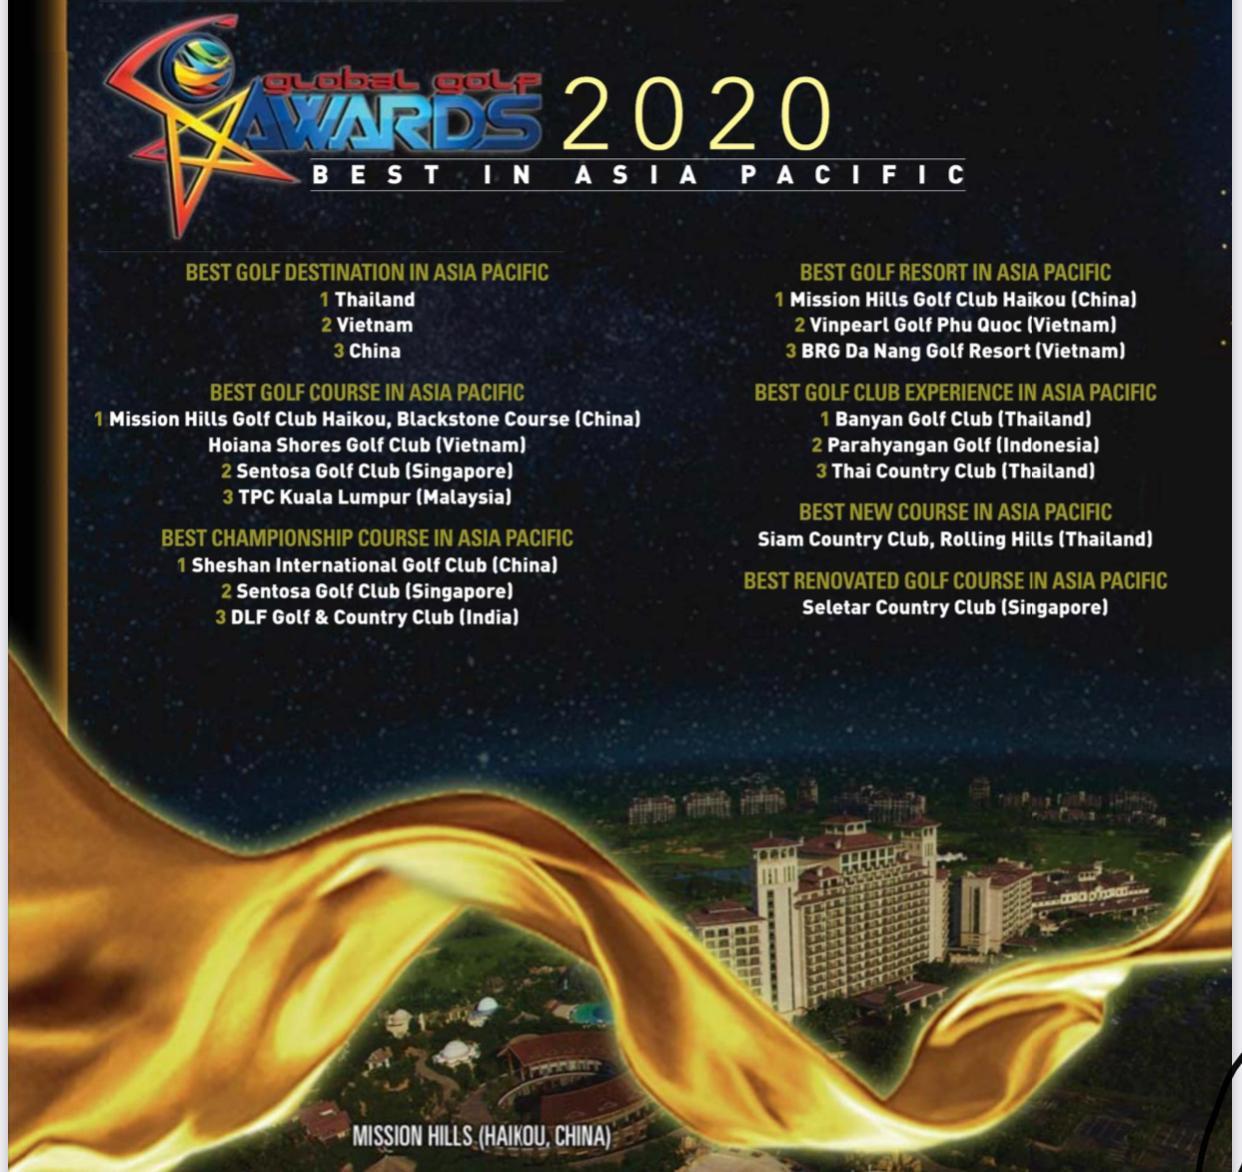 global golf awards 2020